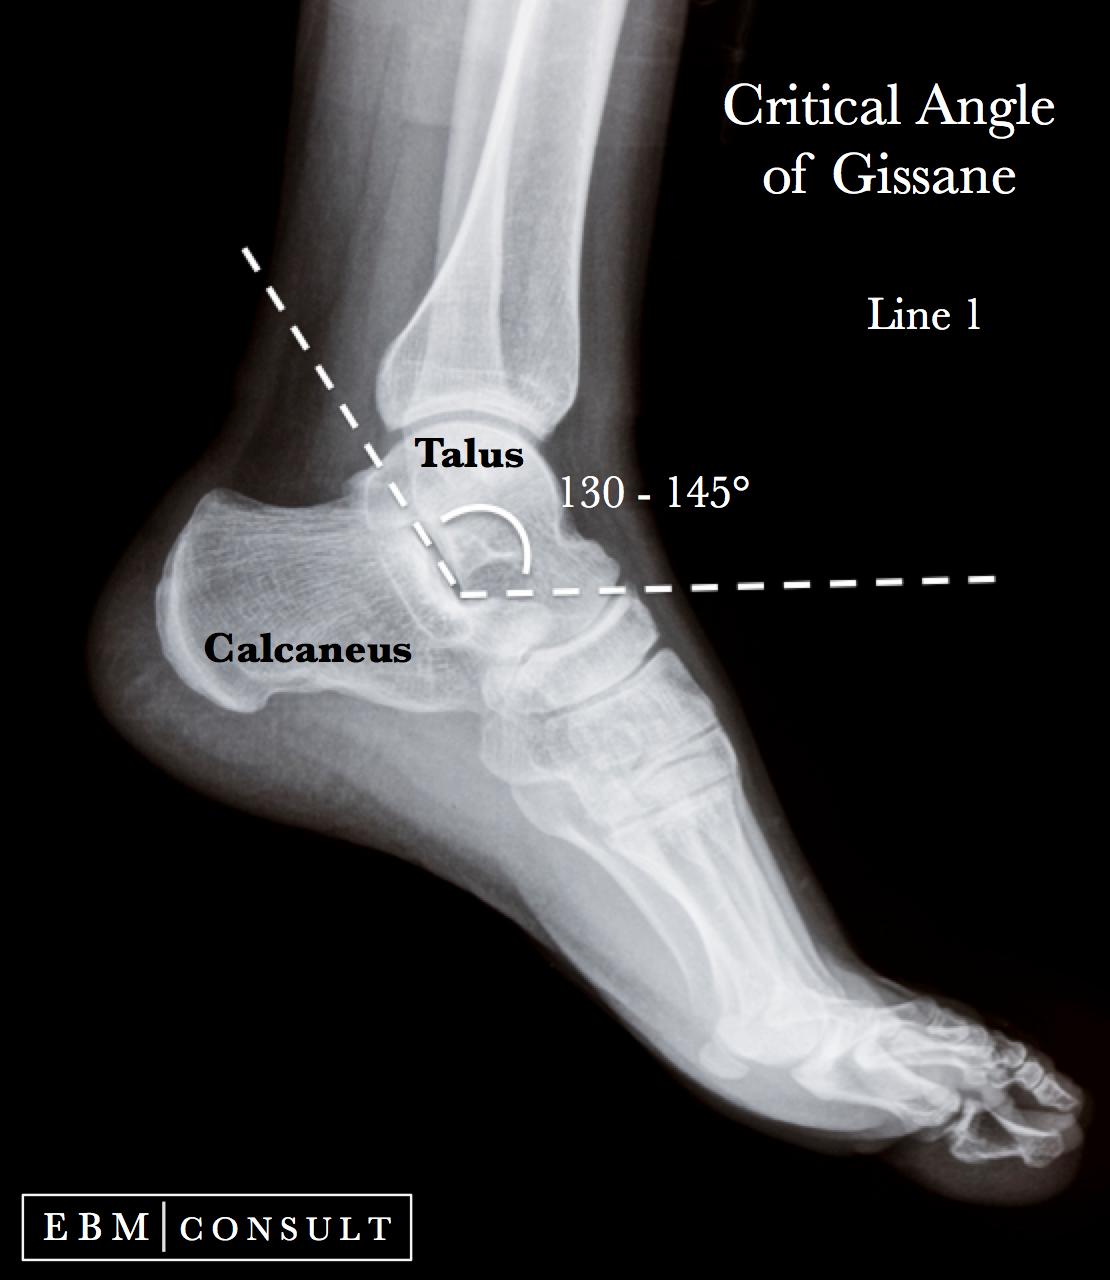 Gissane Angle Ankle Xray | Traumatología | Pinterest | Radiología ...